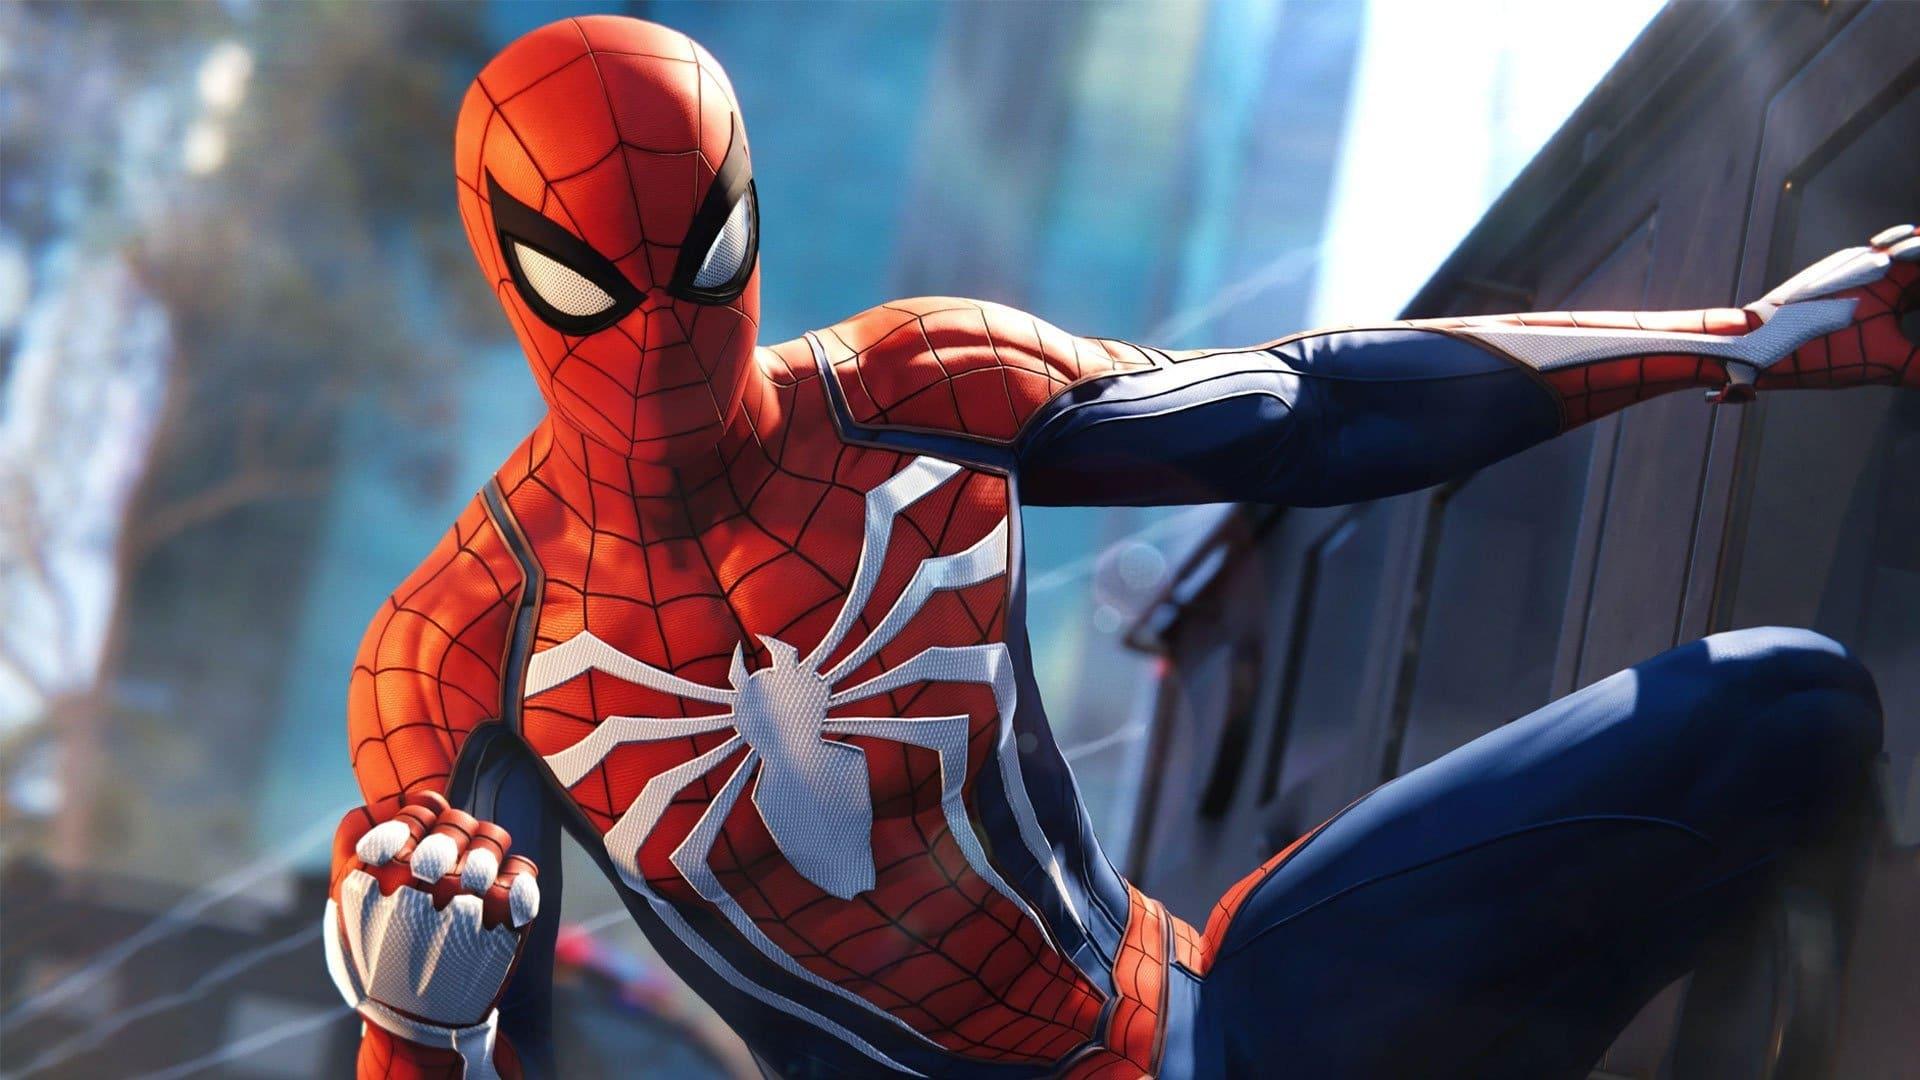 Marvels Spider-Man 2, GamersRD